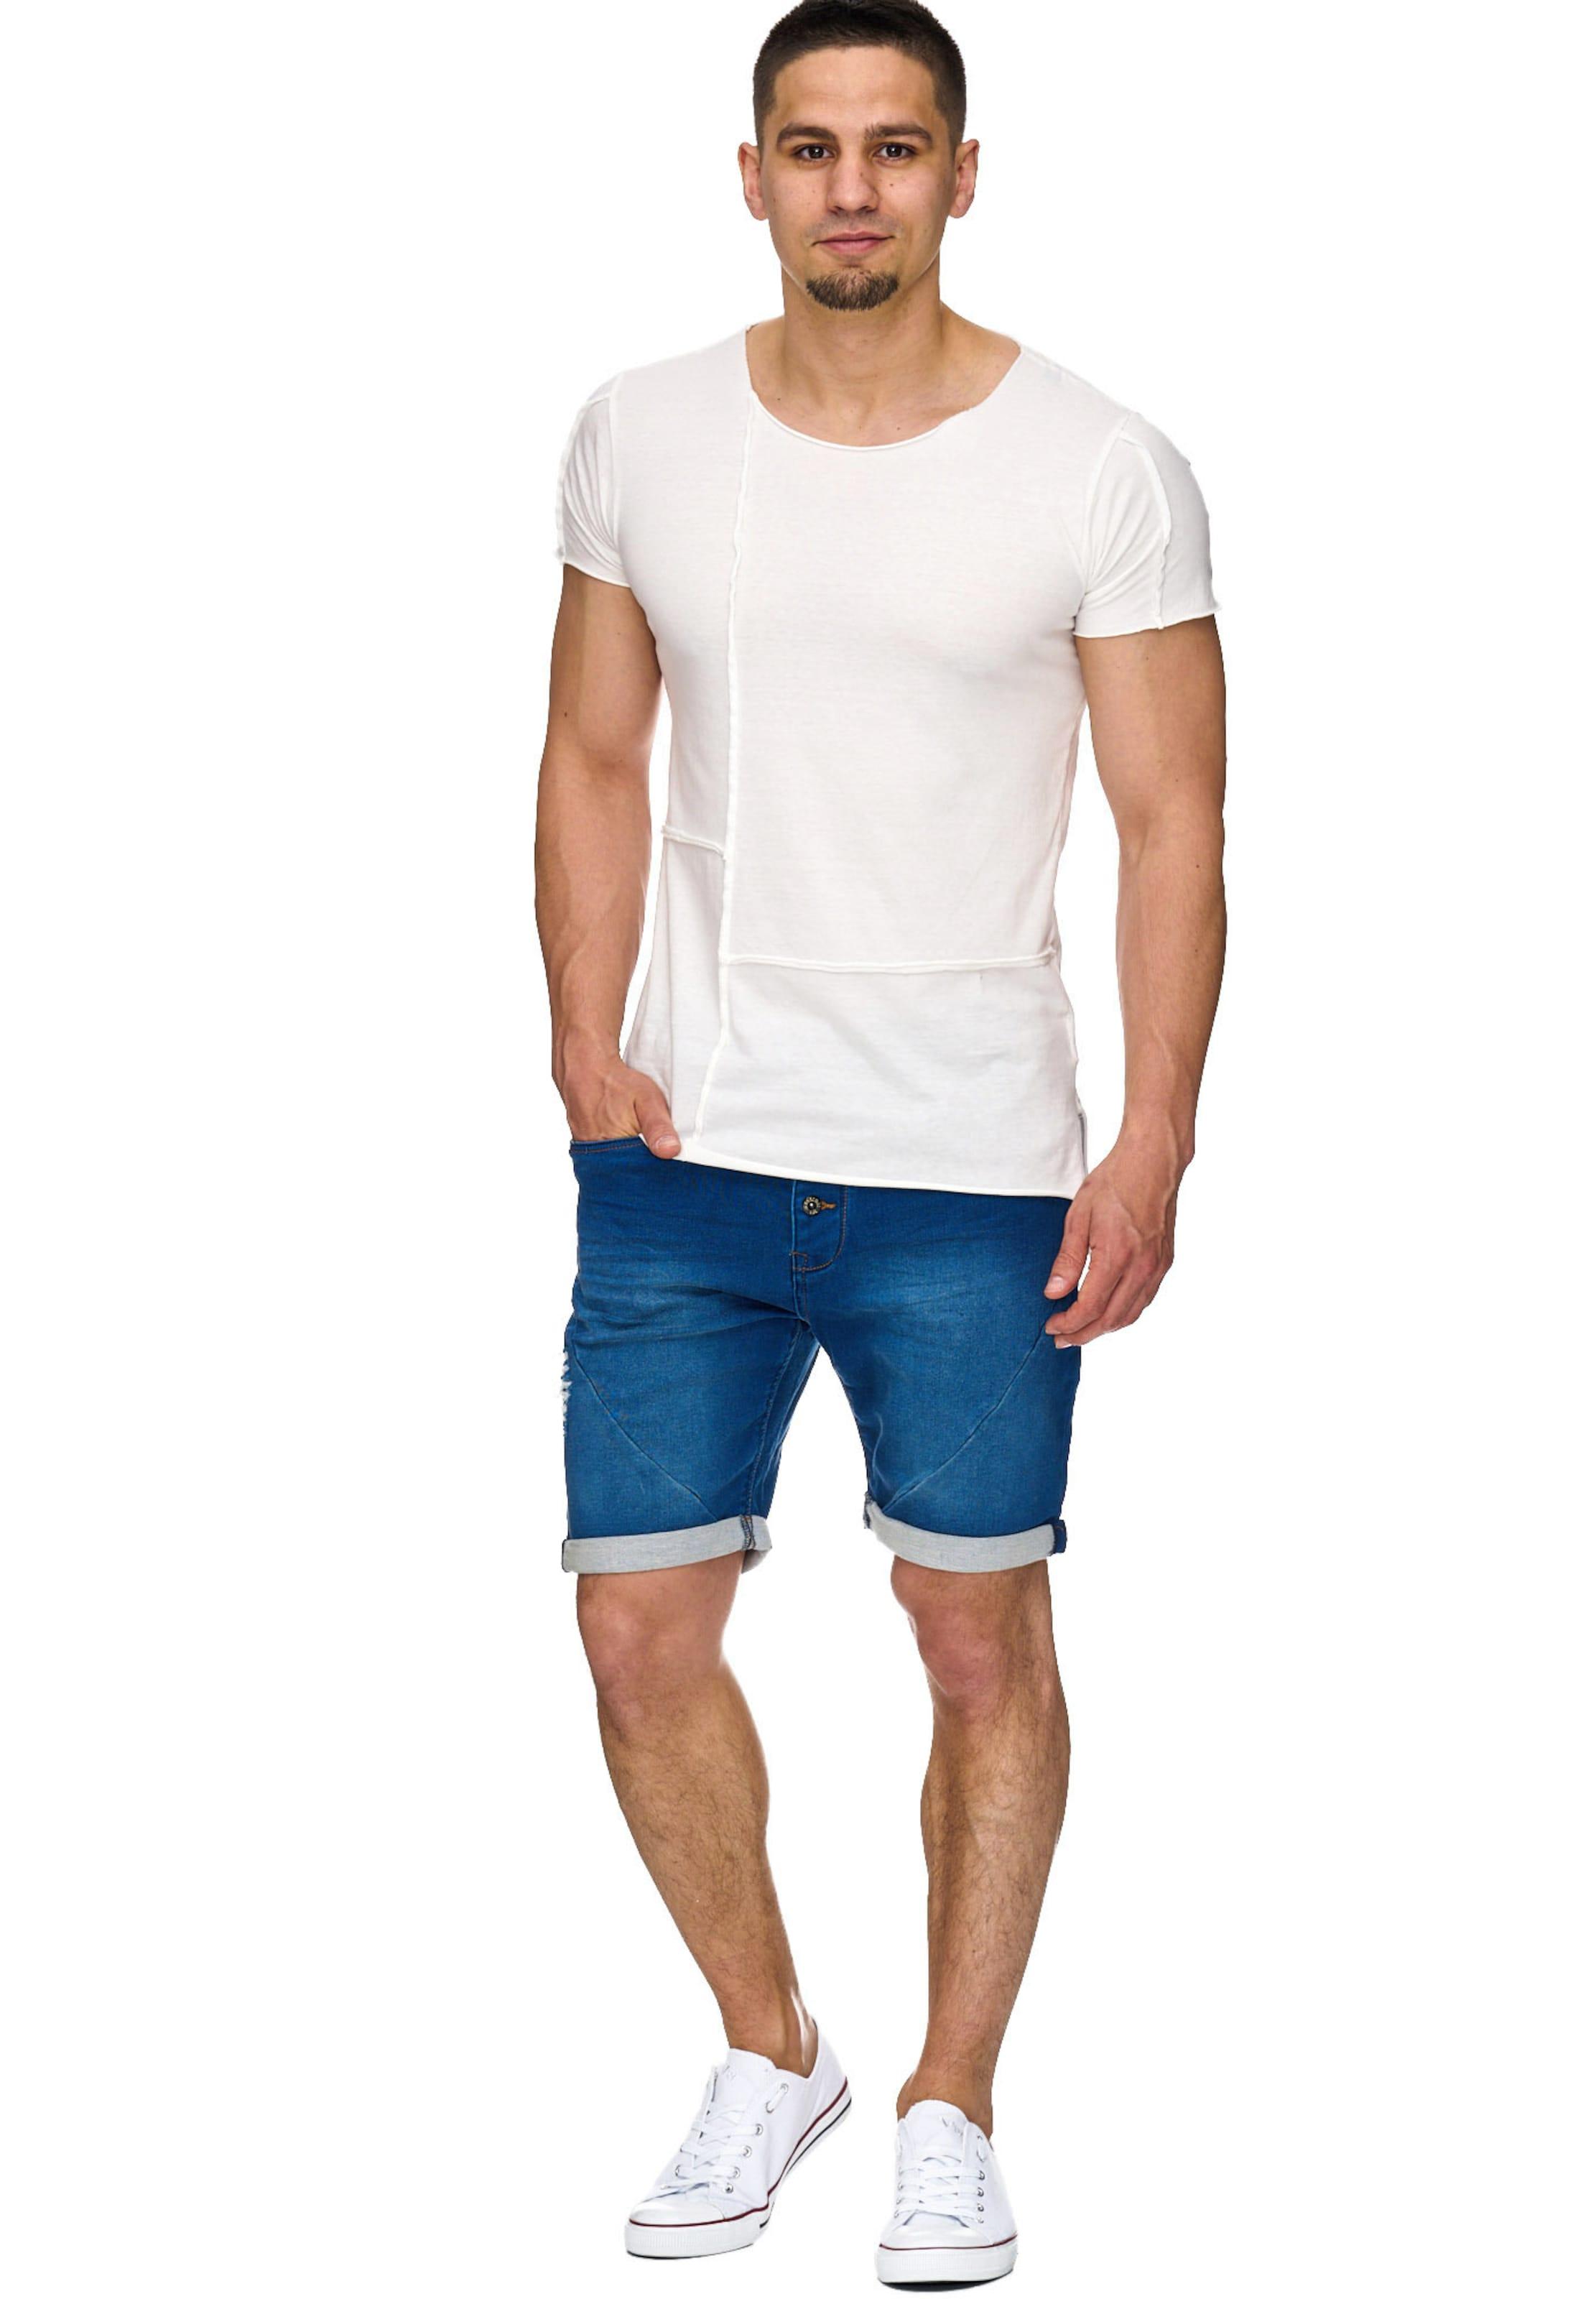 Jeans Navy 'piano' Shorts In Indicode Xn0PwOkN8